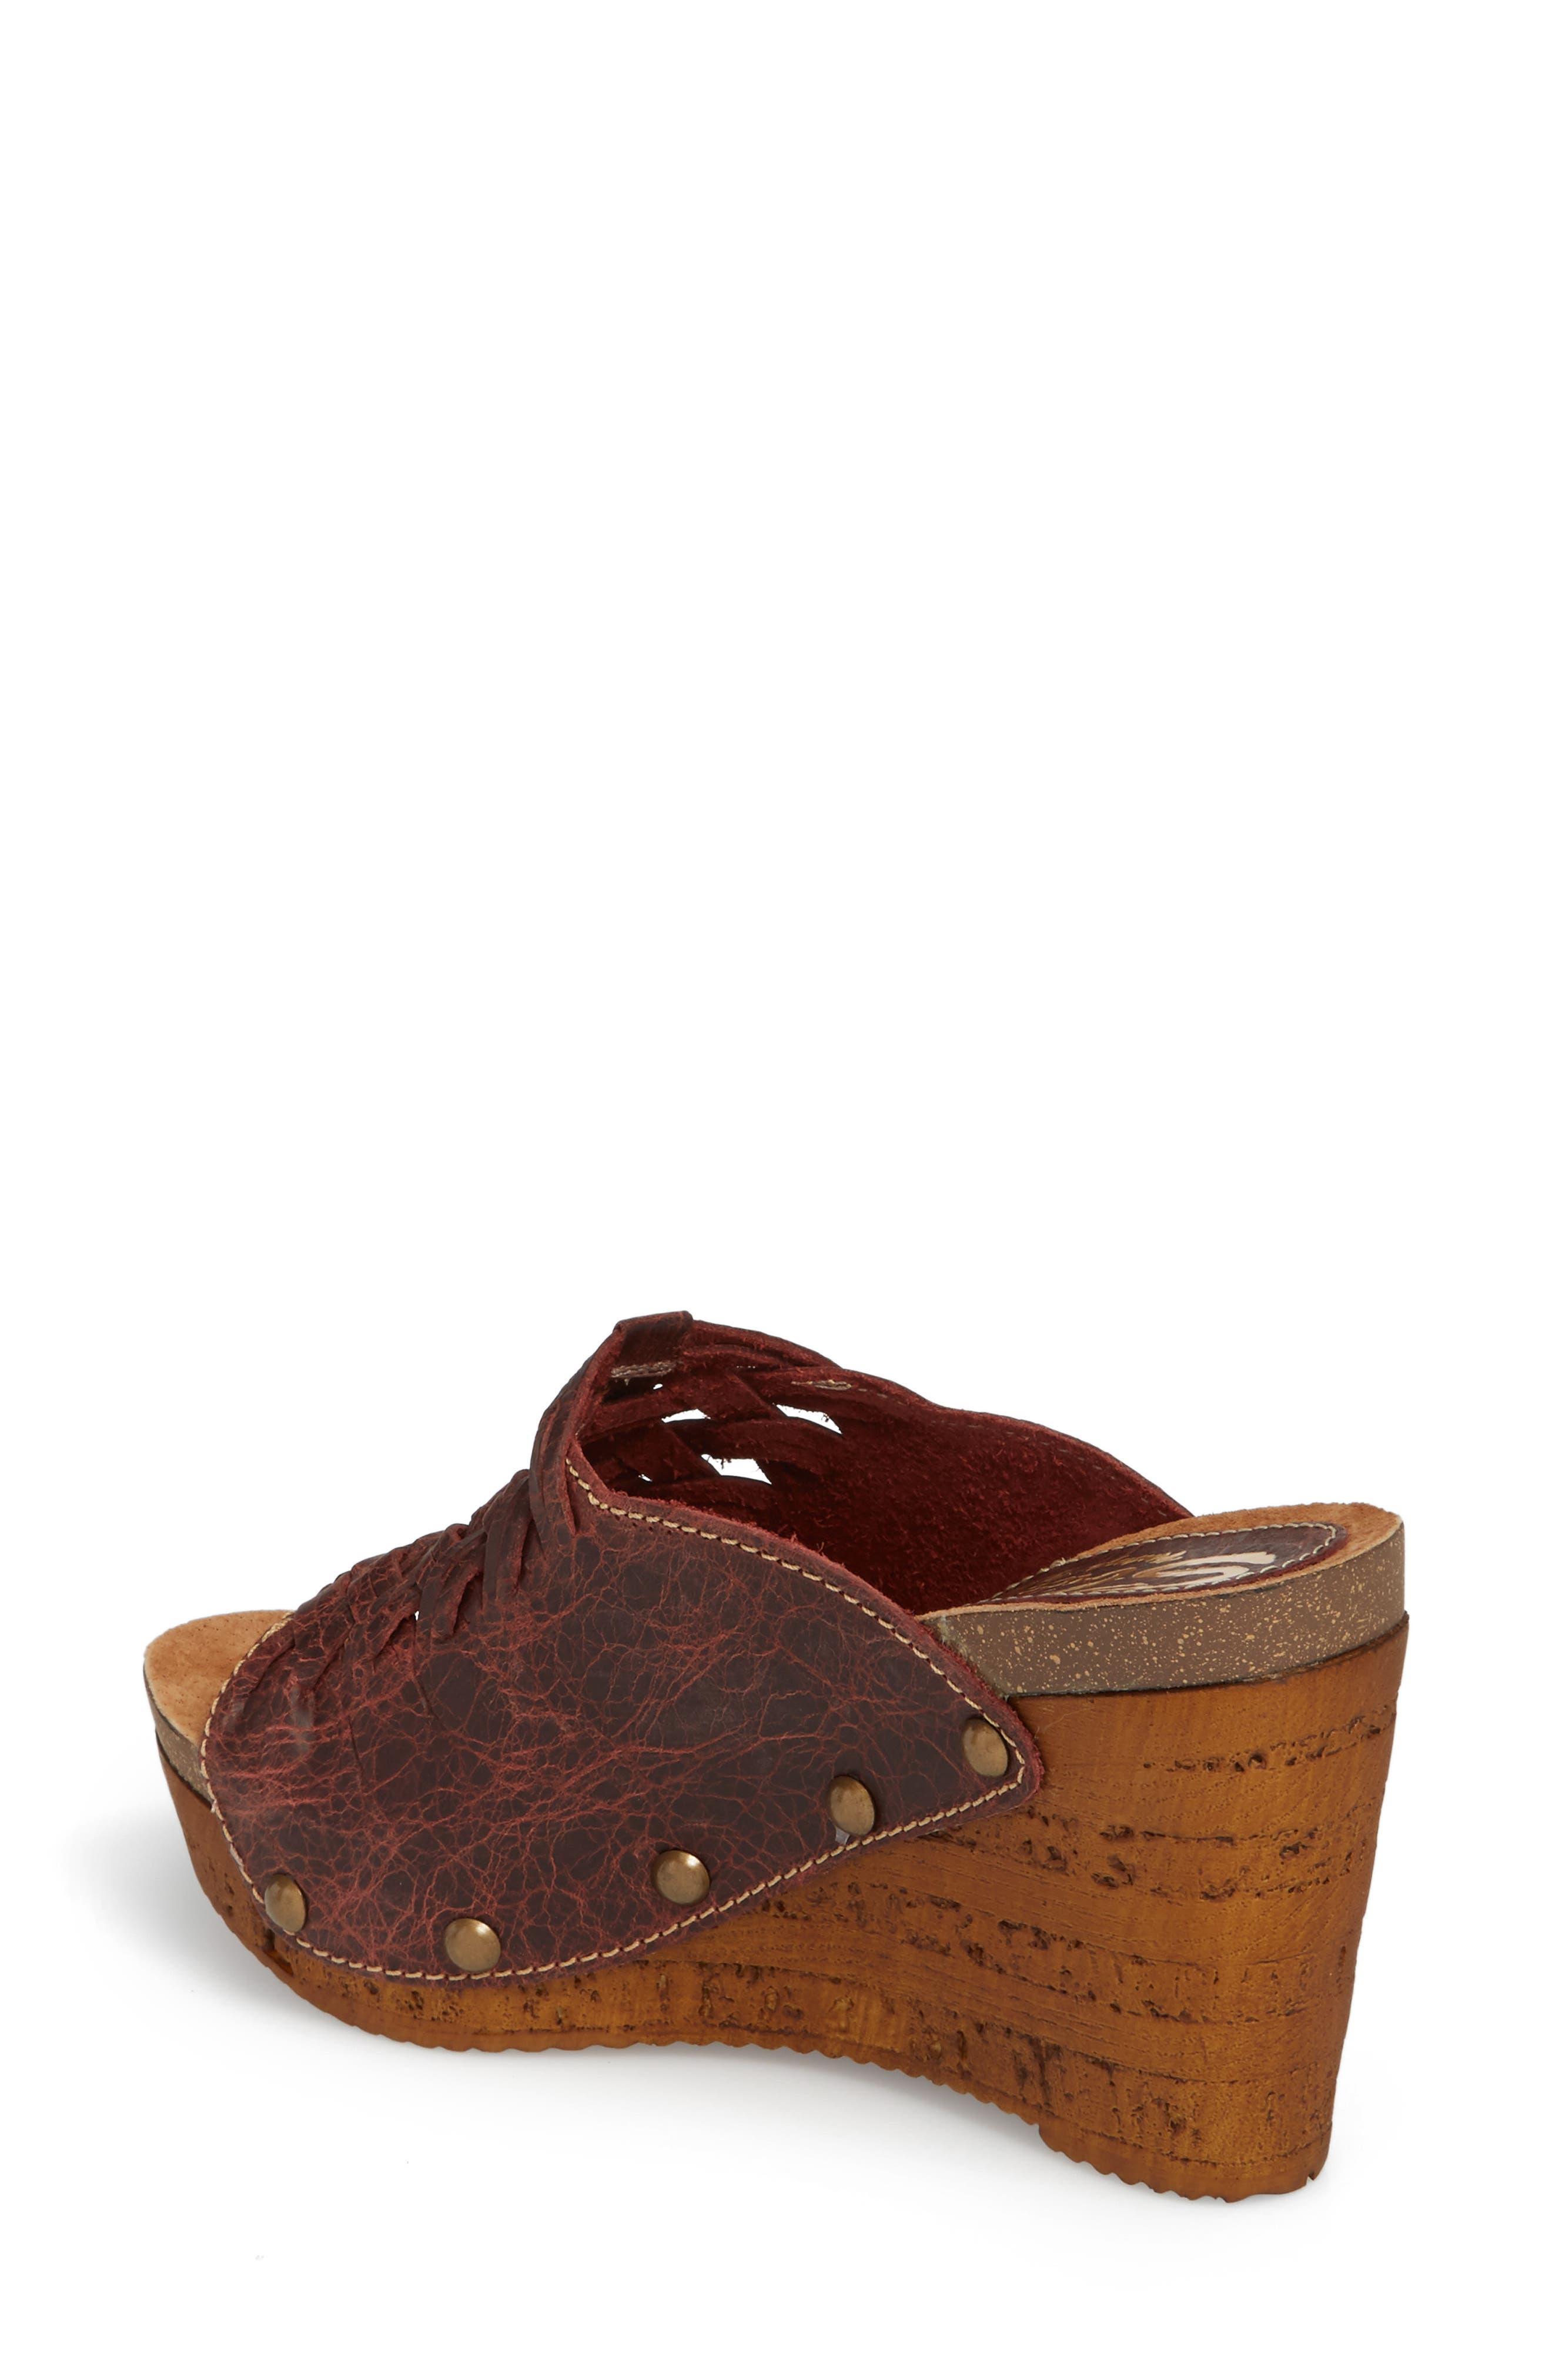 Genesis Platform Wedge Sandal,                             Alternate thumbnail 2, color,                             WINE